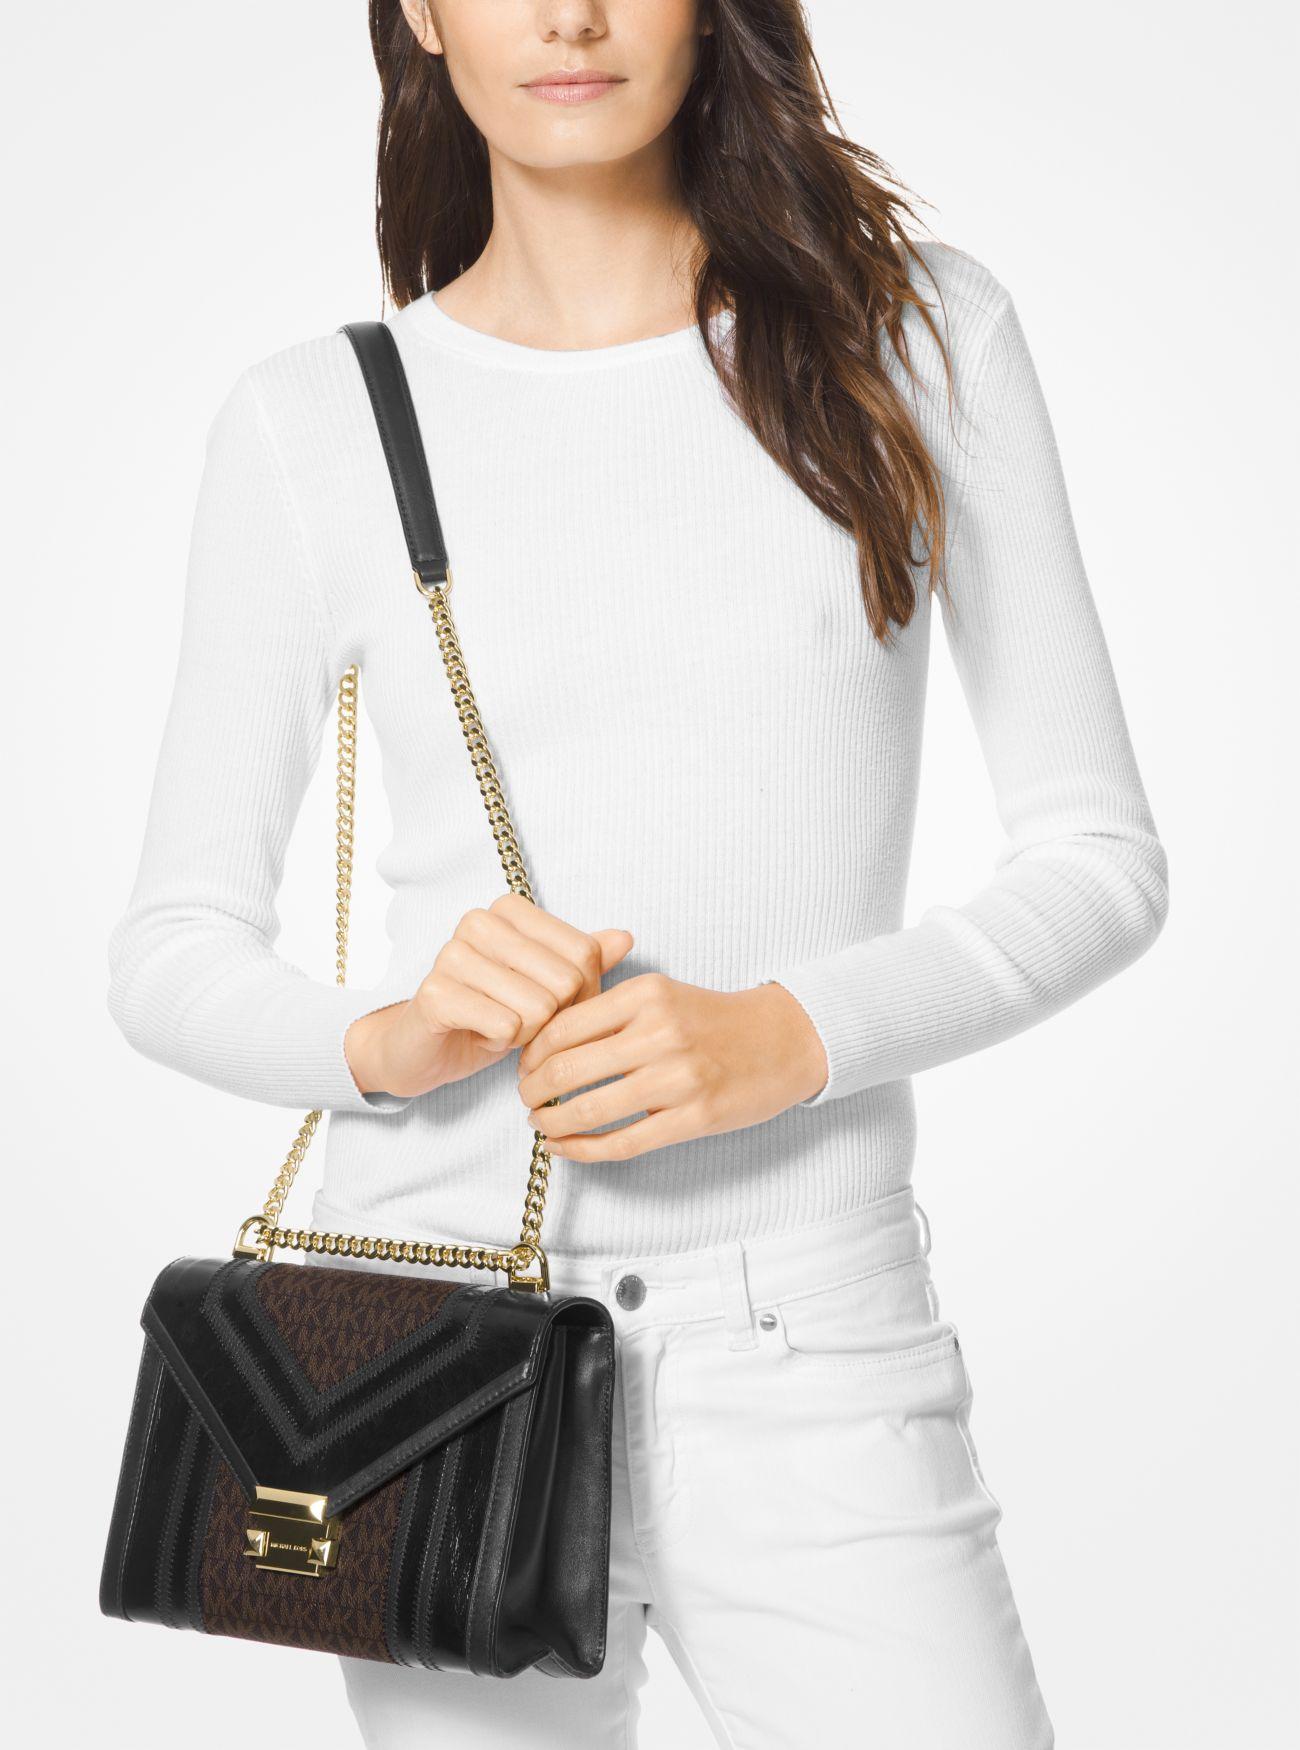 959865f0a9b2 Whitney Large Logo Convertible Shoulder Bag | Michael Kors